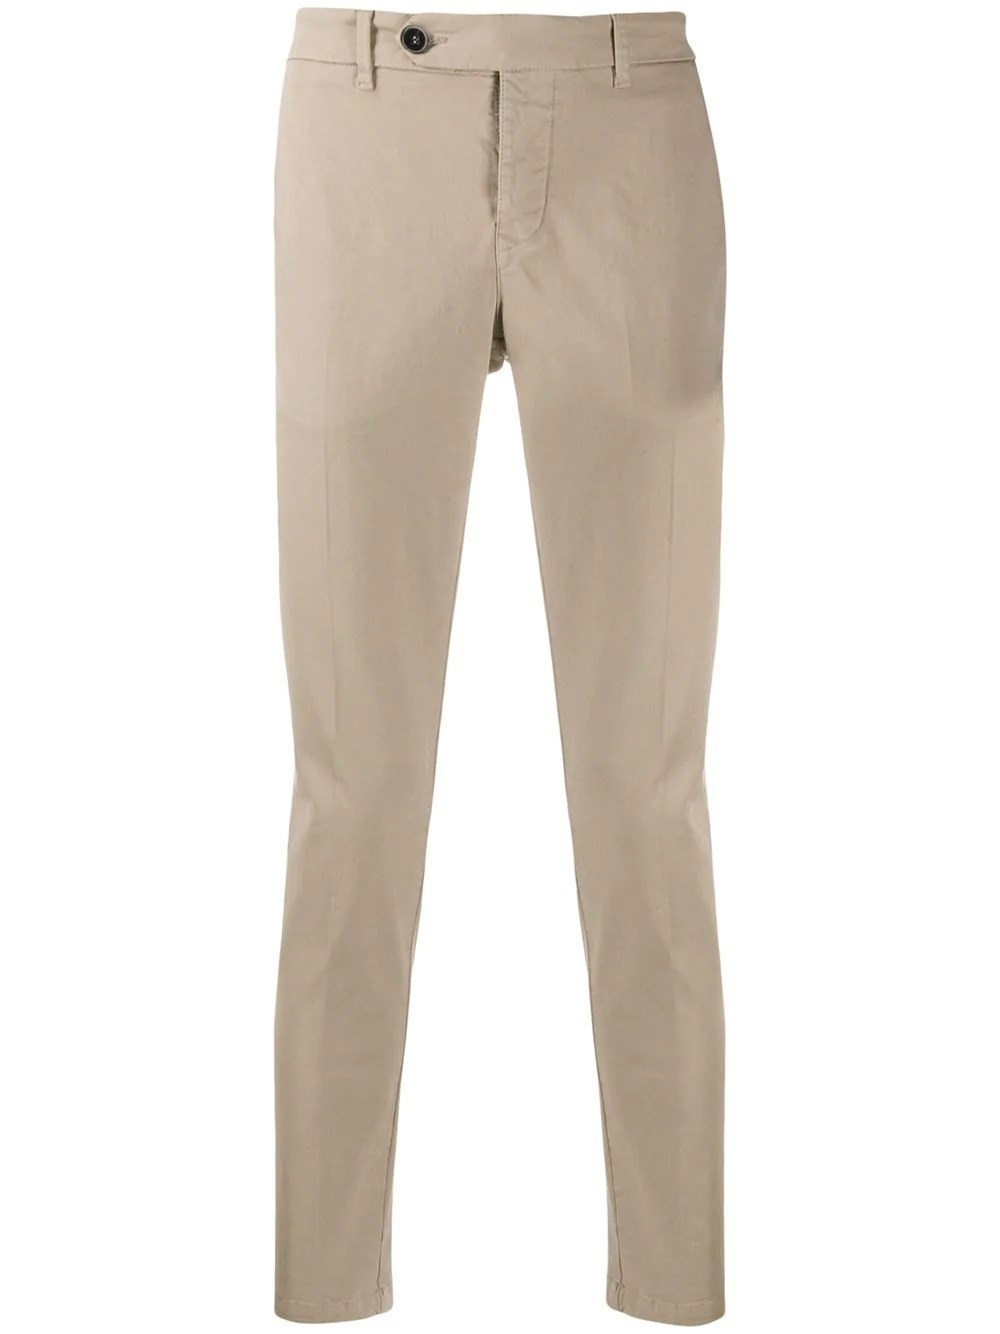 AL DUCA D'AOSTA 1902 Casual Slim Fit Cotton Trousers